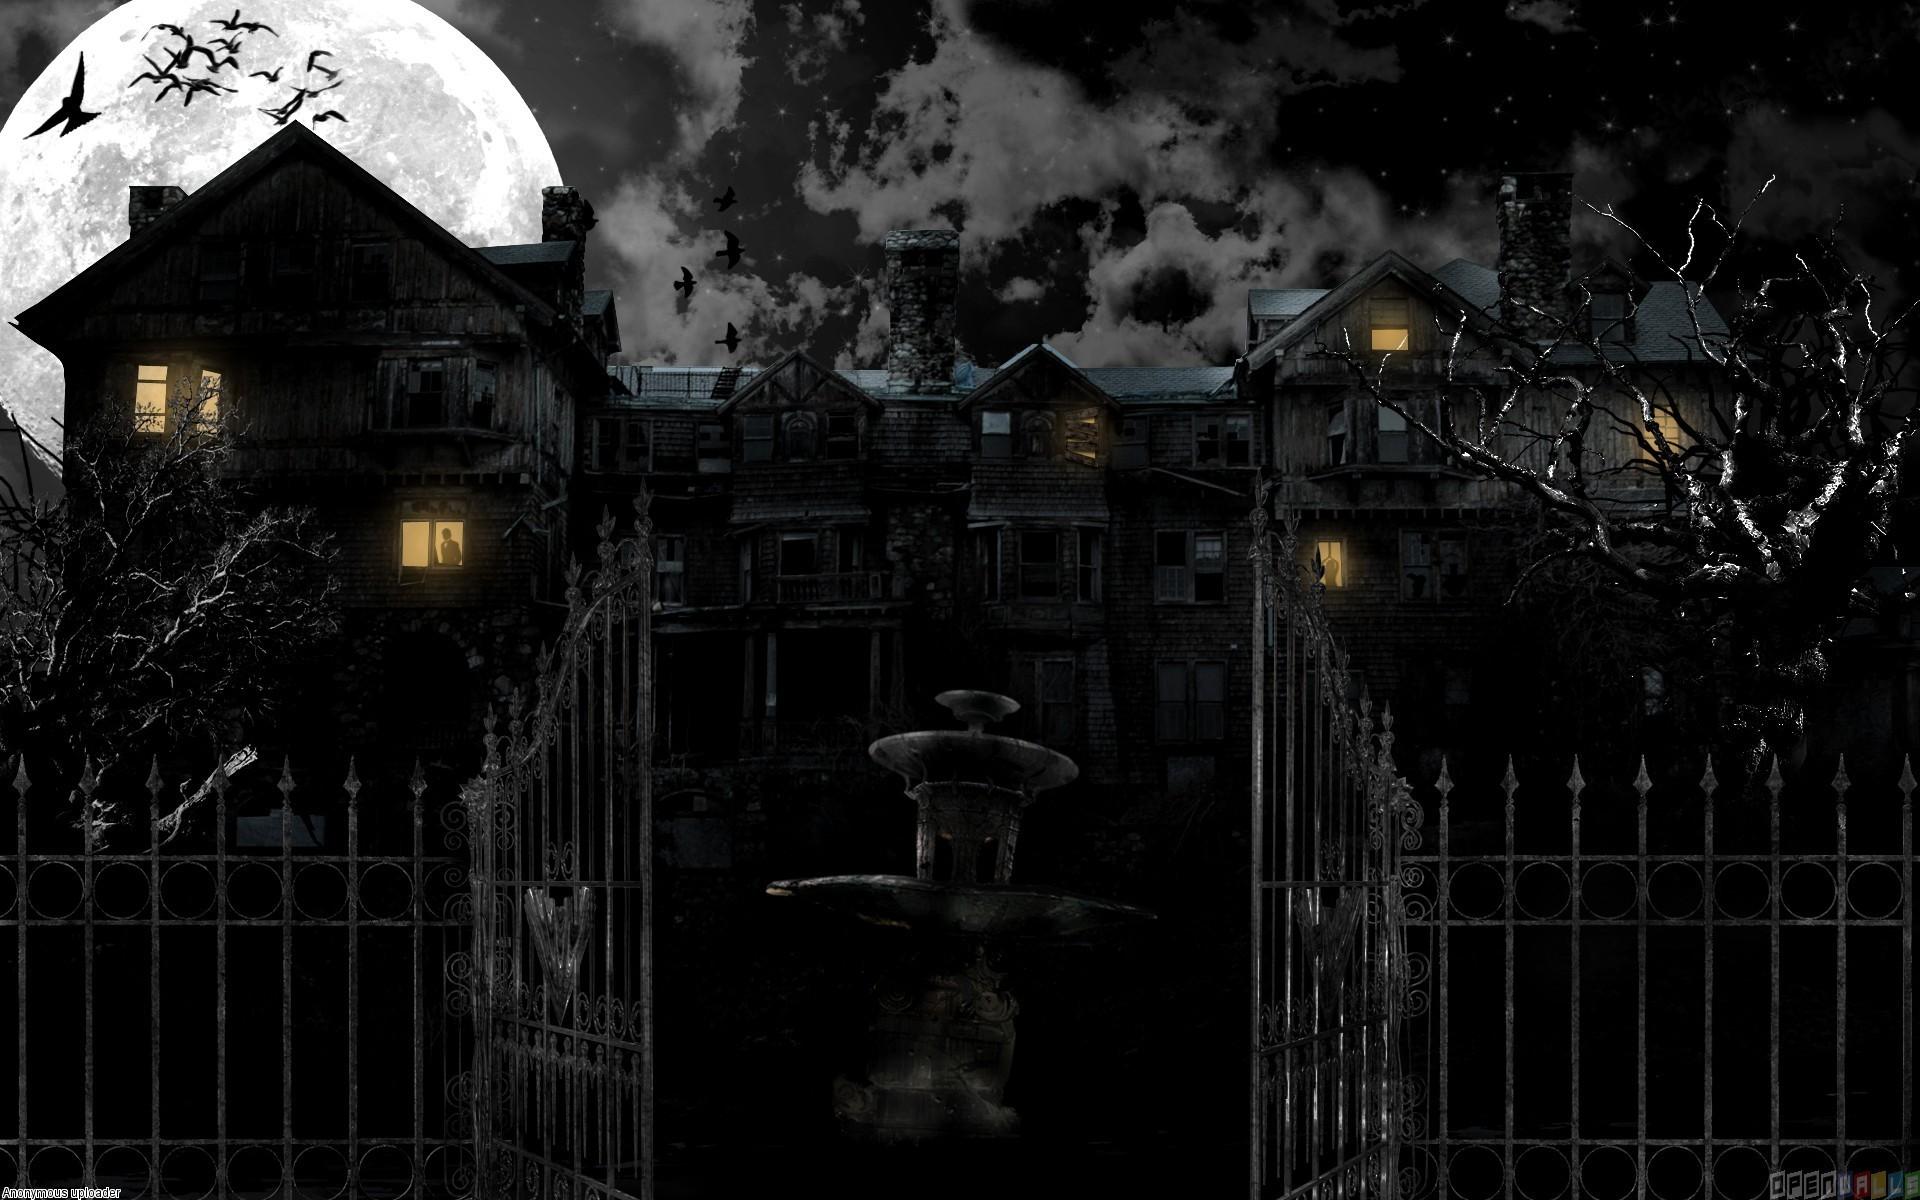 Haunted House wallpaper   356910 1920x1200